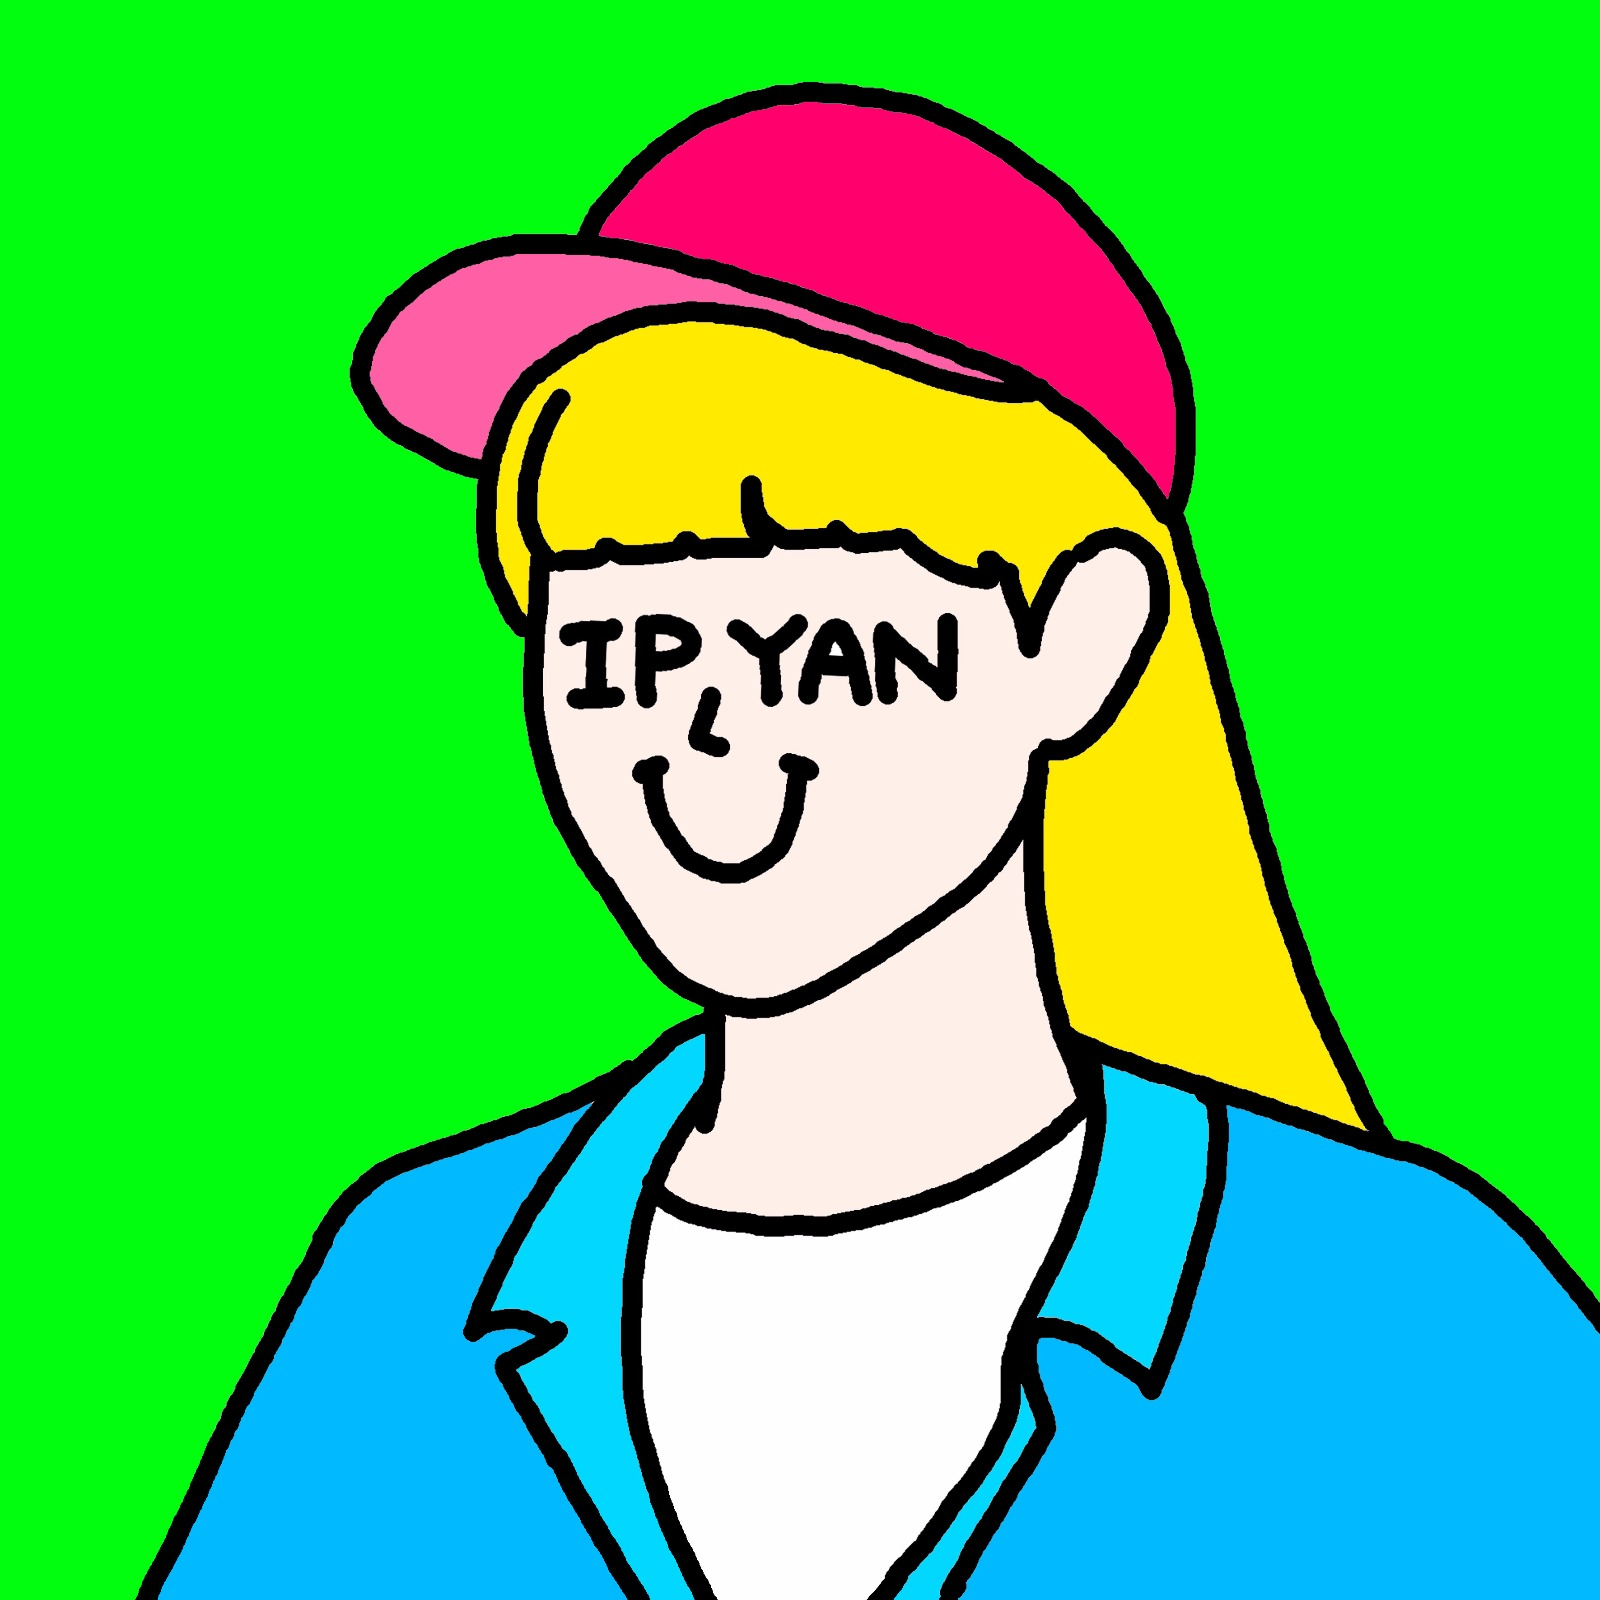 Yan Ip